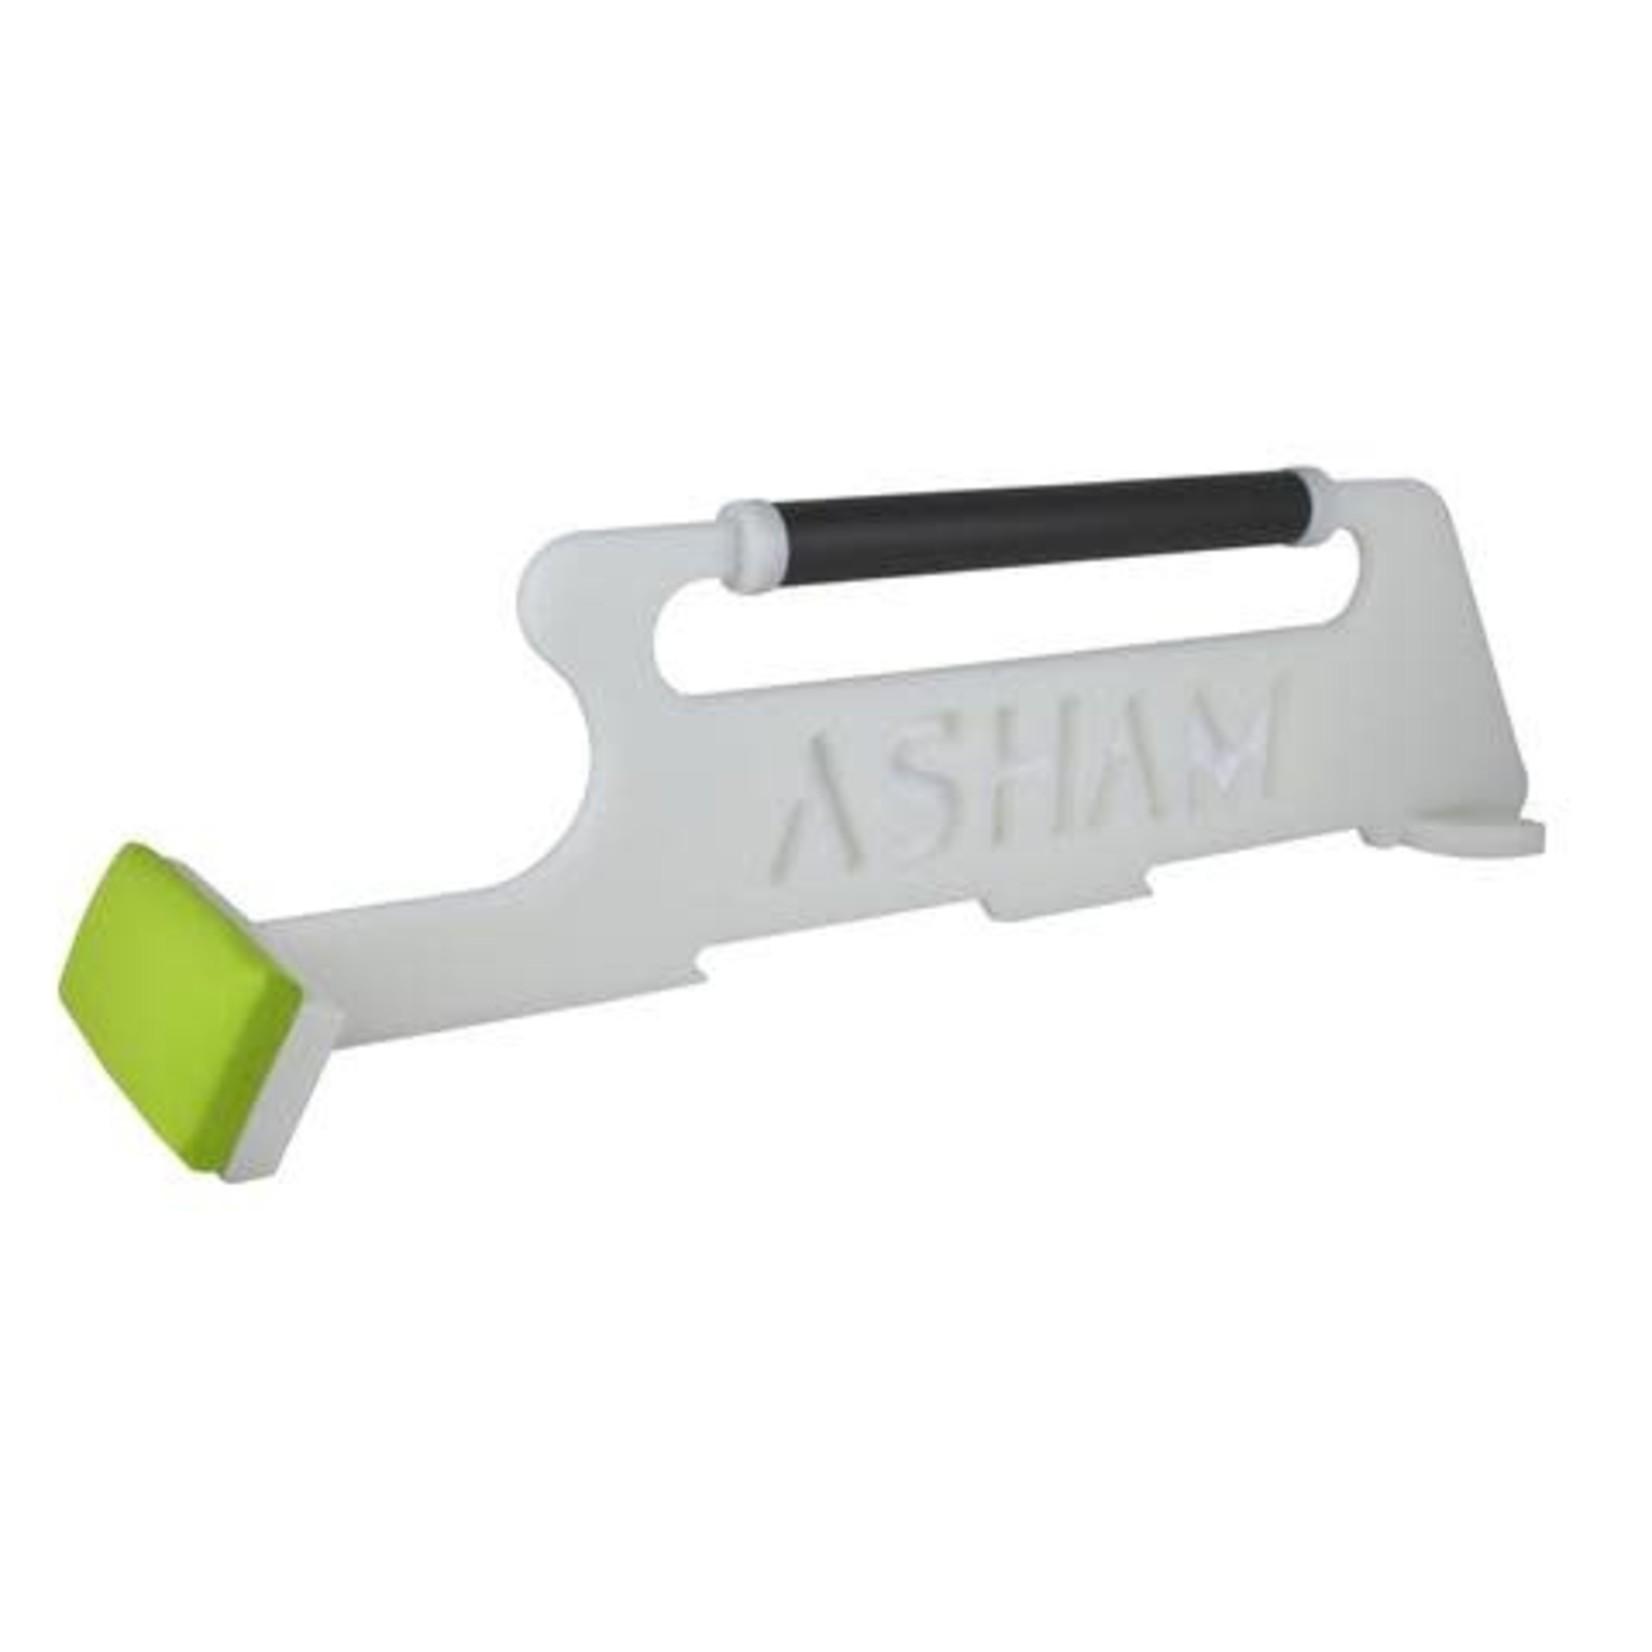 Asham Asham Sliding Crutch w/ Pad